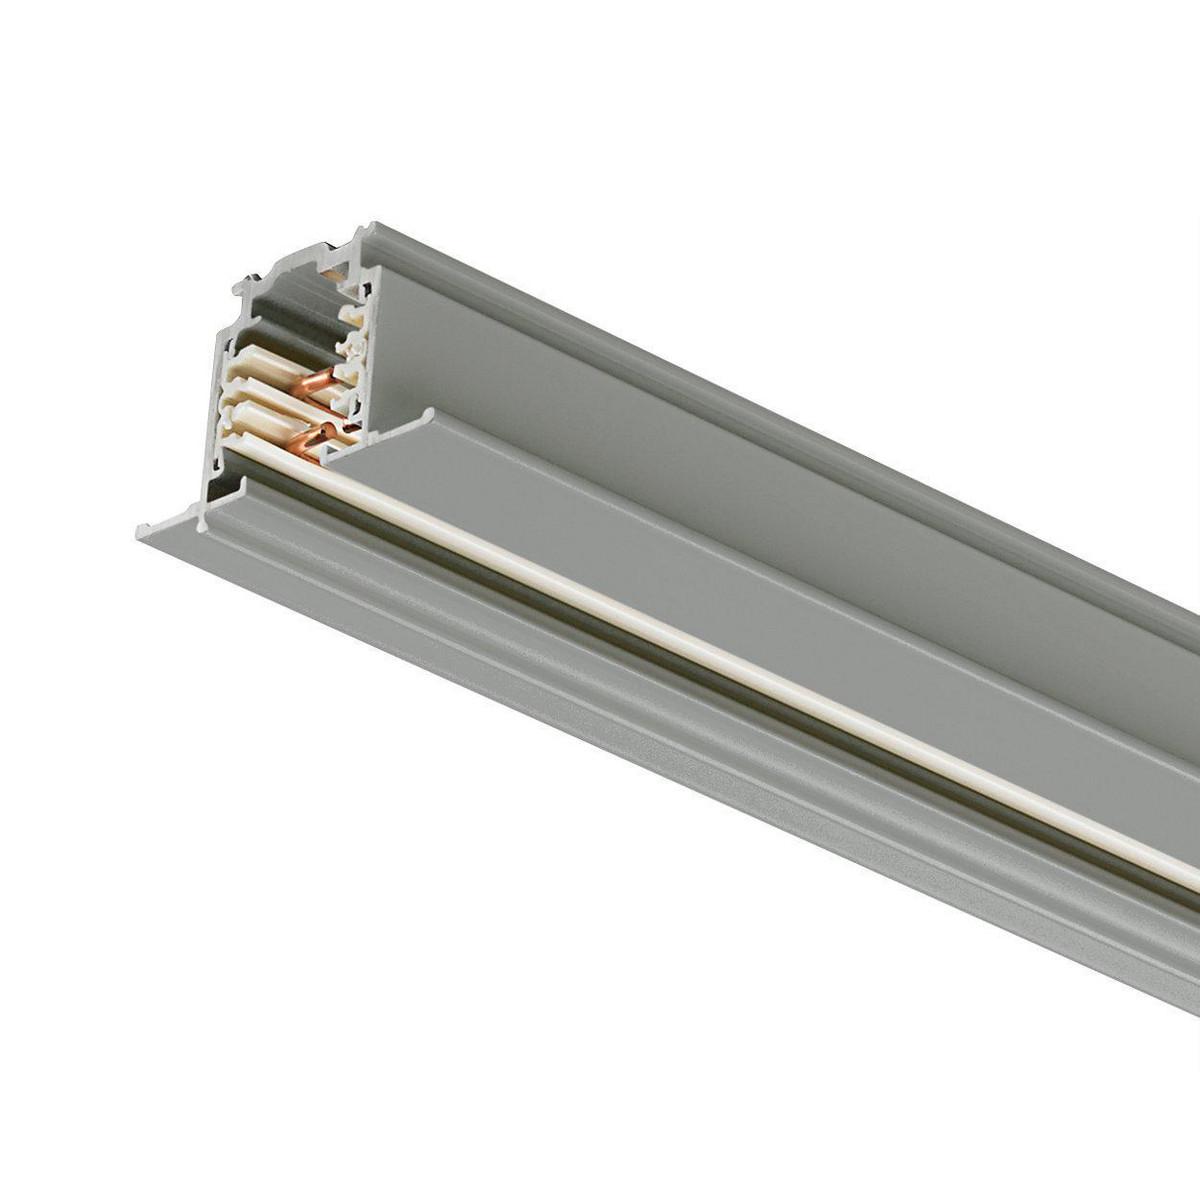 GLOBAL XTSCF6100-1 Strømskinne (Indbyg) DALI 1M Alu